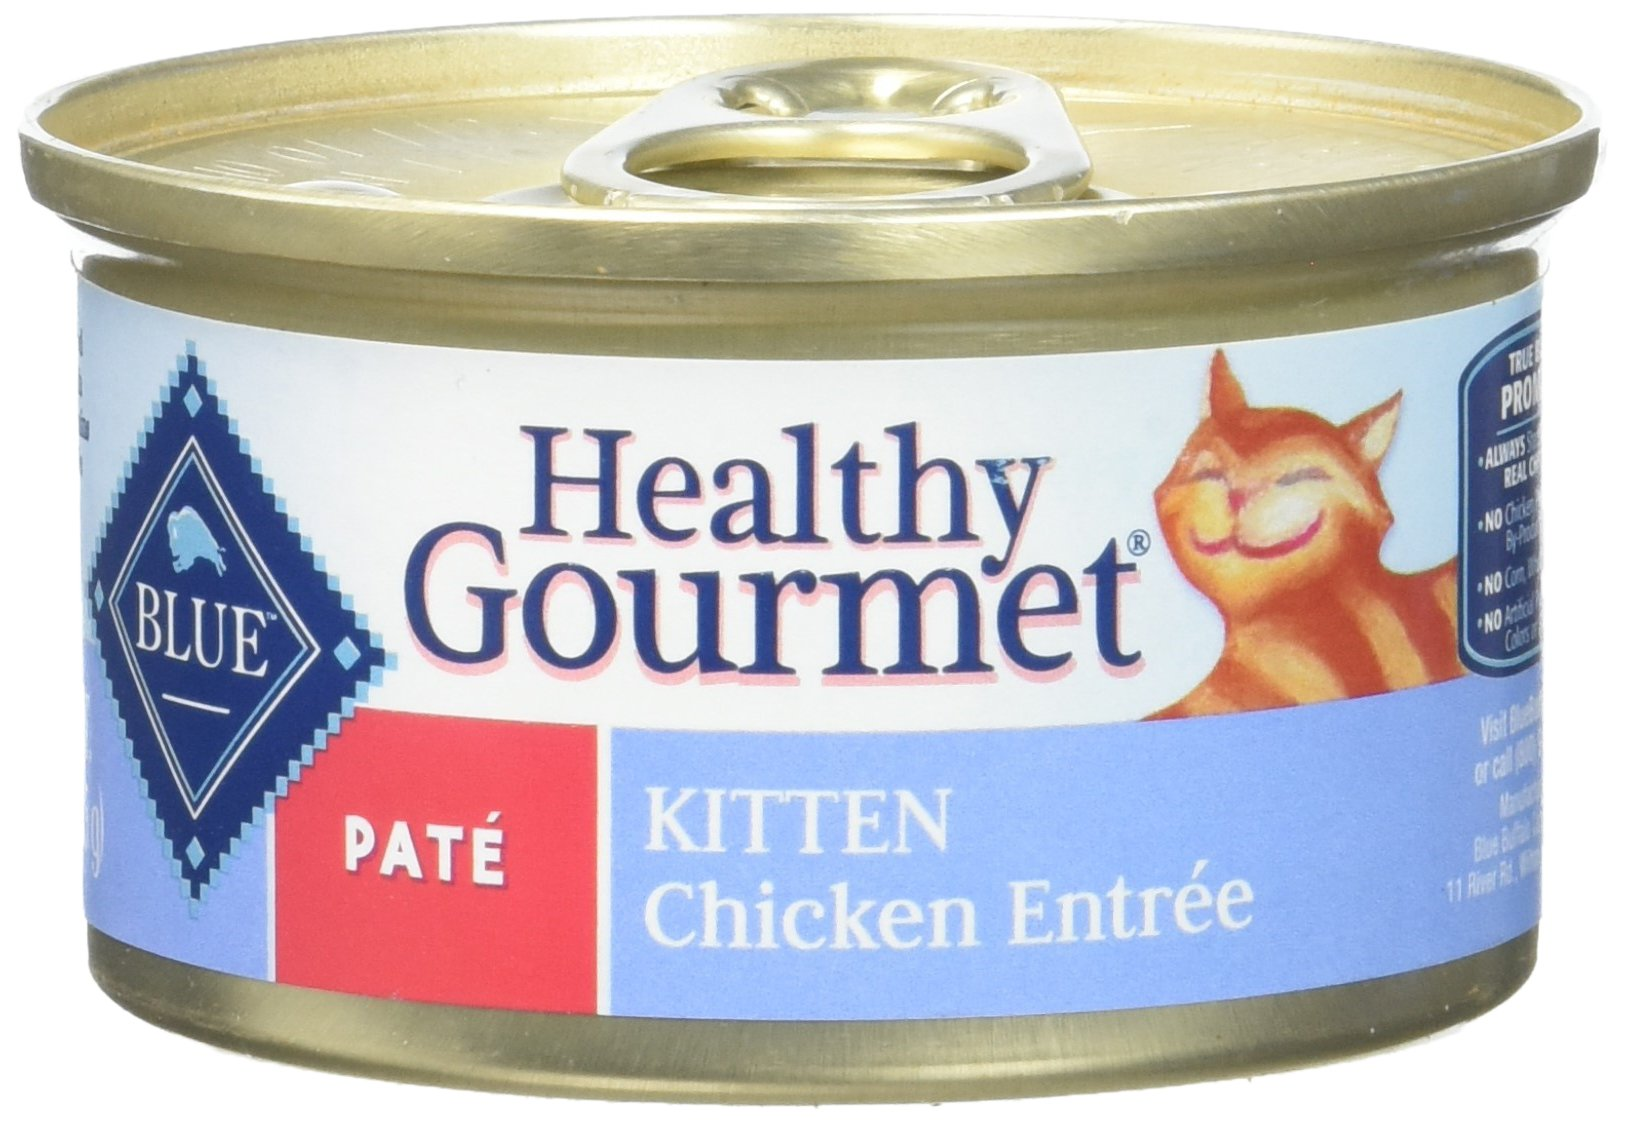 Blue Buffalo Healthy Gourmet Chicken Canned Kitten Food, 3 Oz. (Case Of 24 Cans) by Blue Buffalo